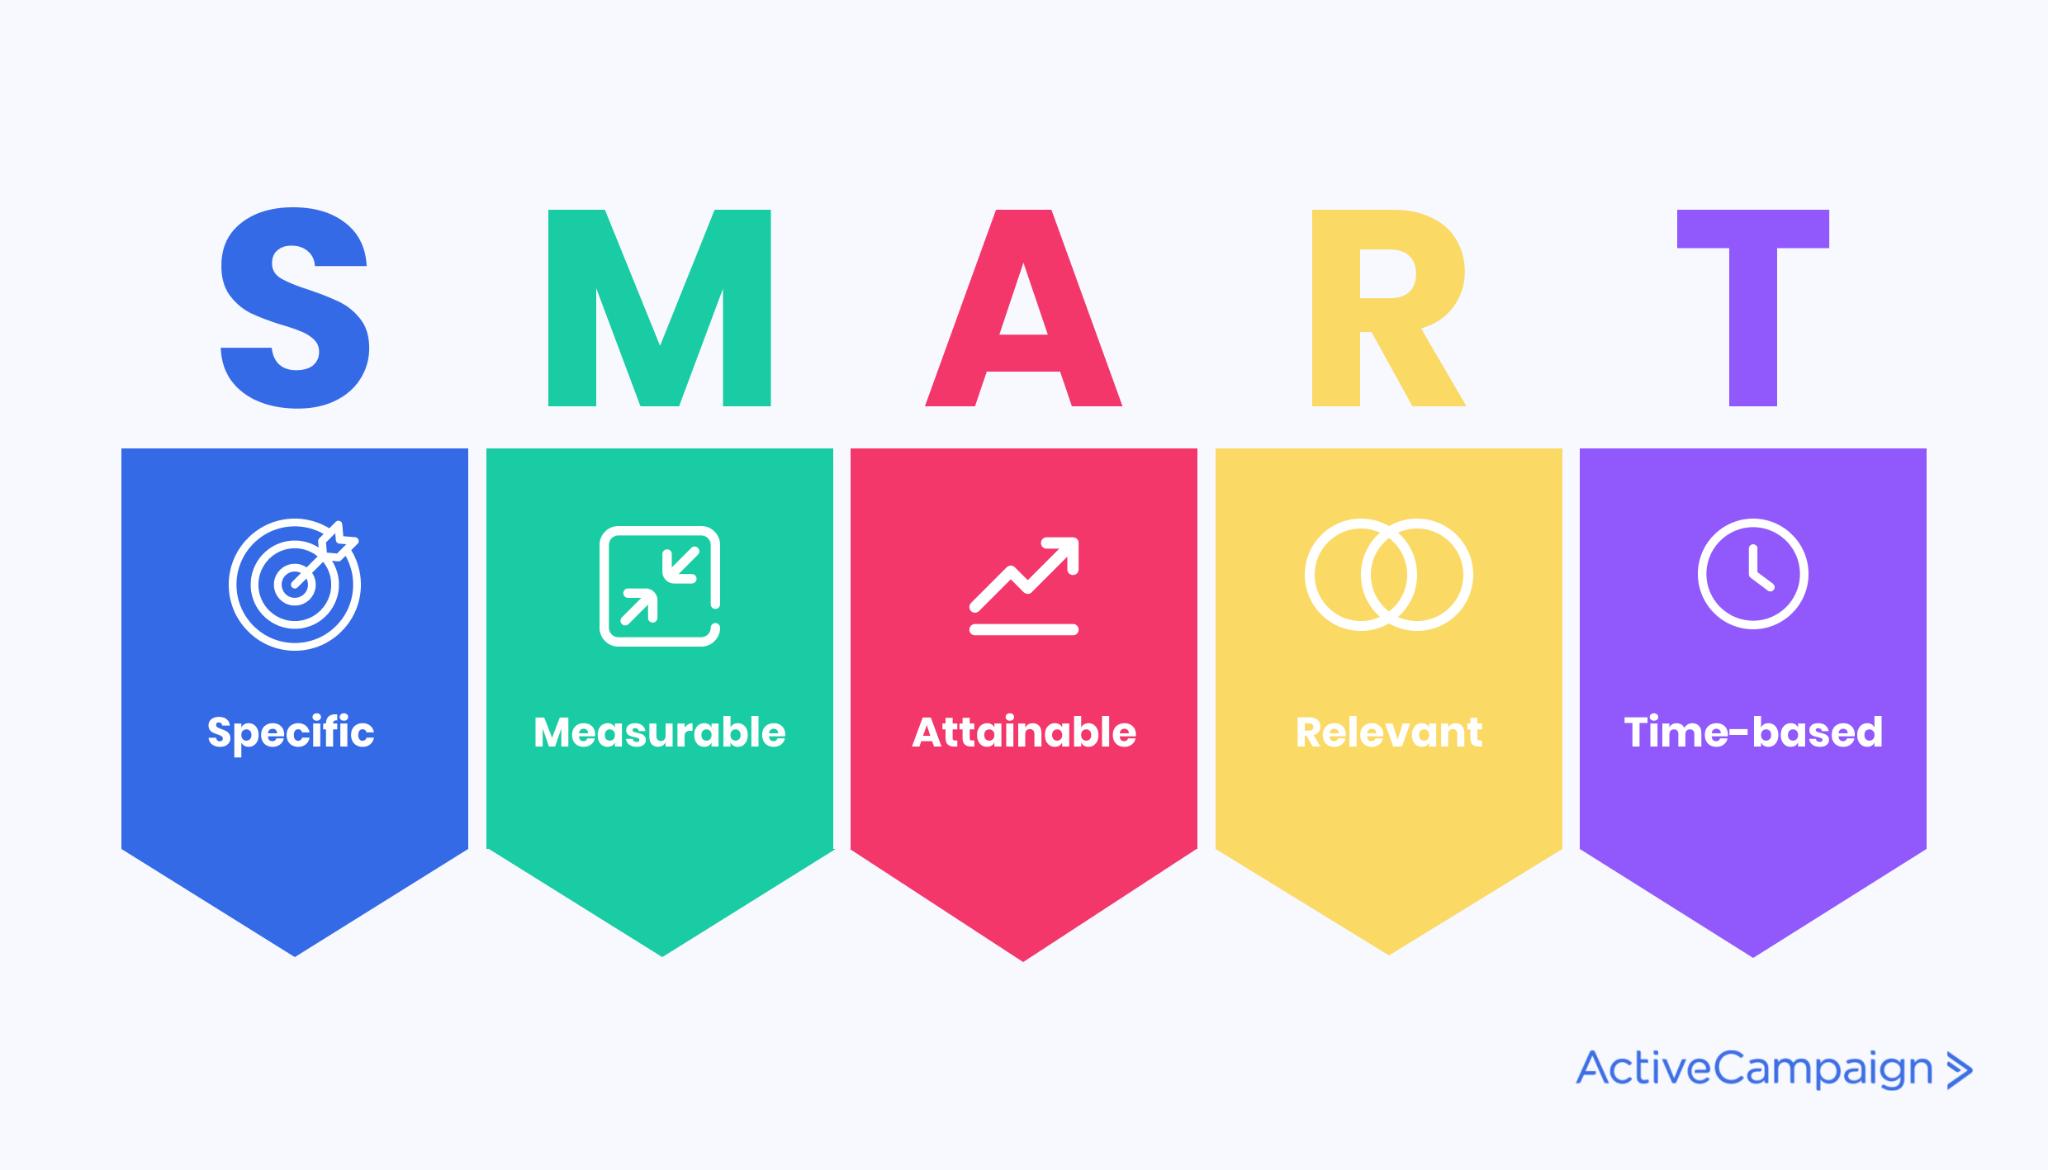 Image of the SMART goals acronym